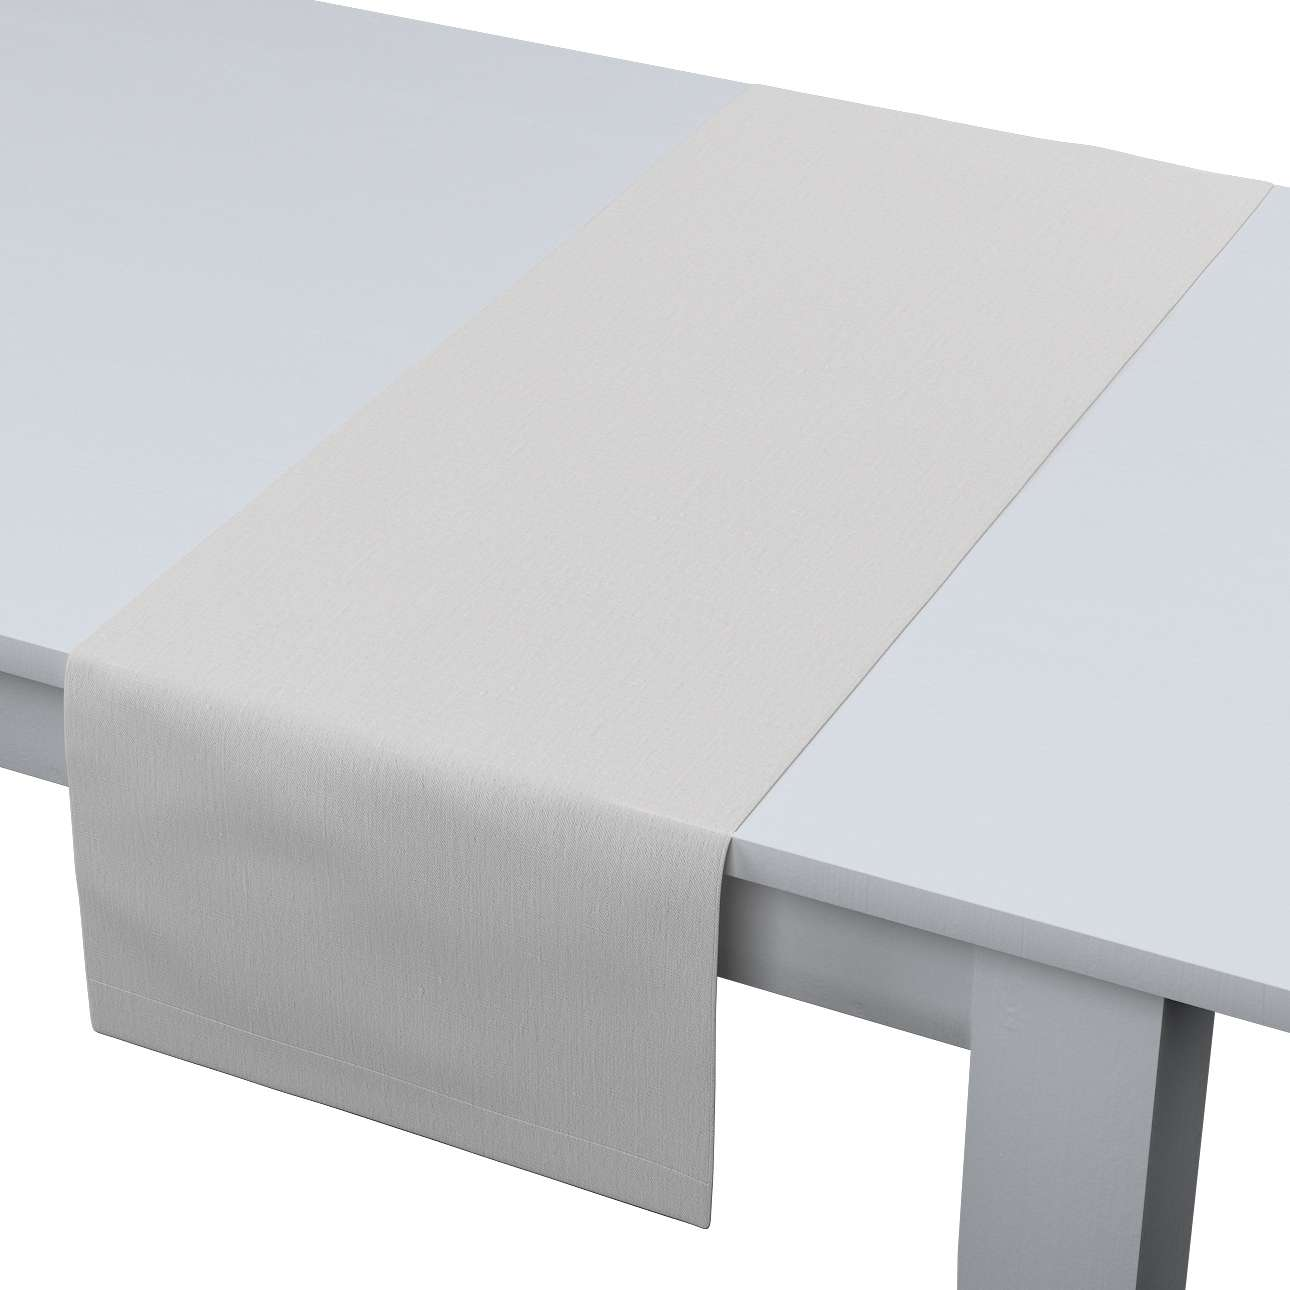 Štóla na stôl V kolekcii Linen, tkanina: 392-04